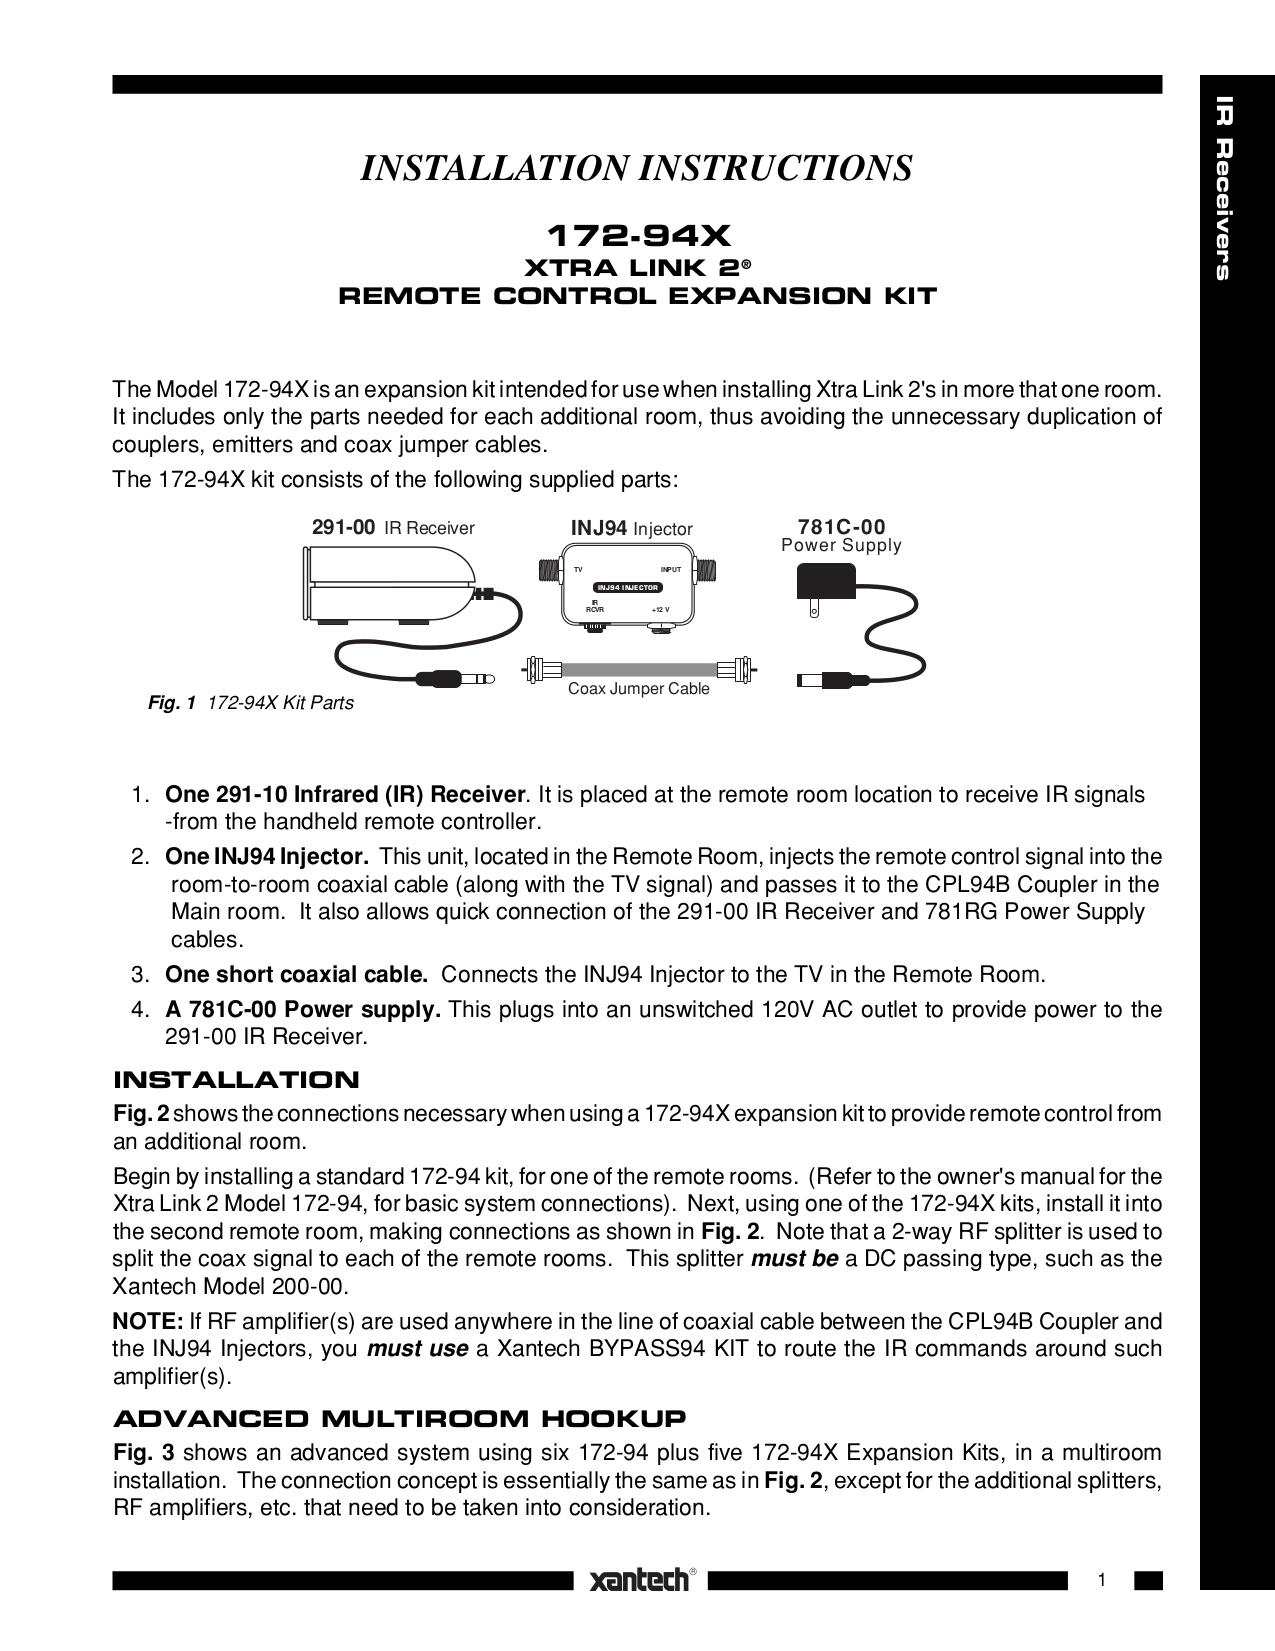 68_17294X.pdf 0 download free pdf for xantech cpl94b couplers other manual xantech ir kit wiring diagram at soozxer.org